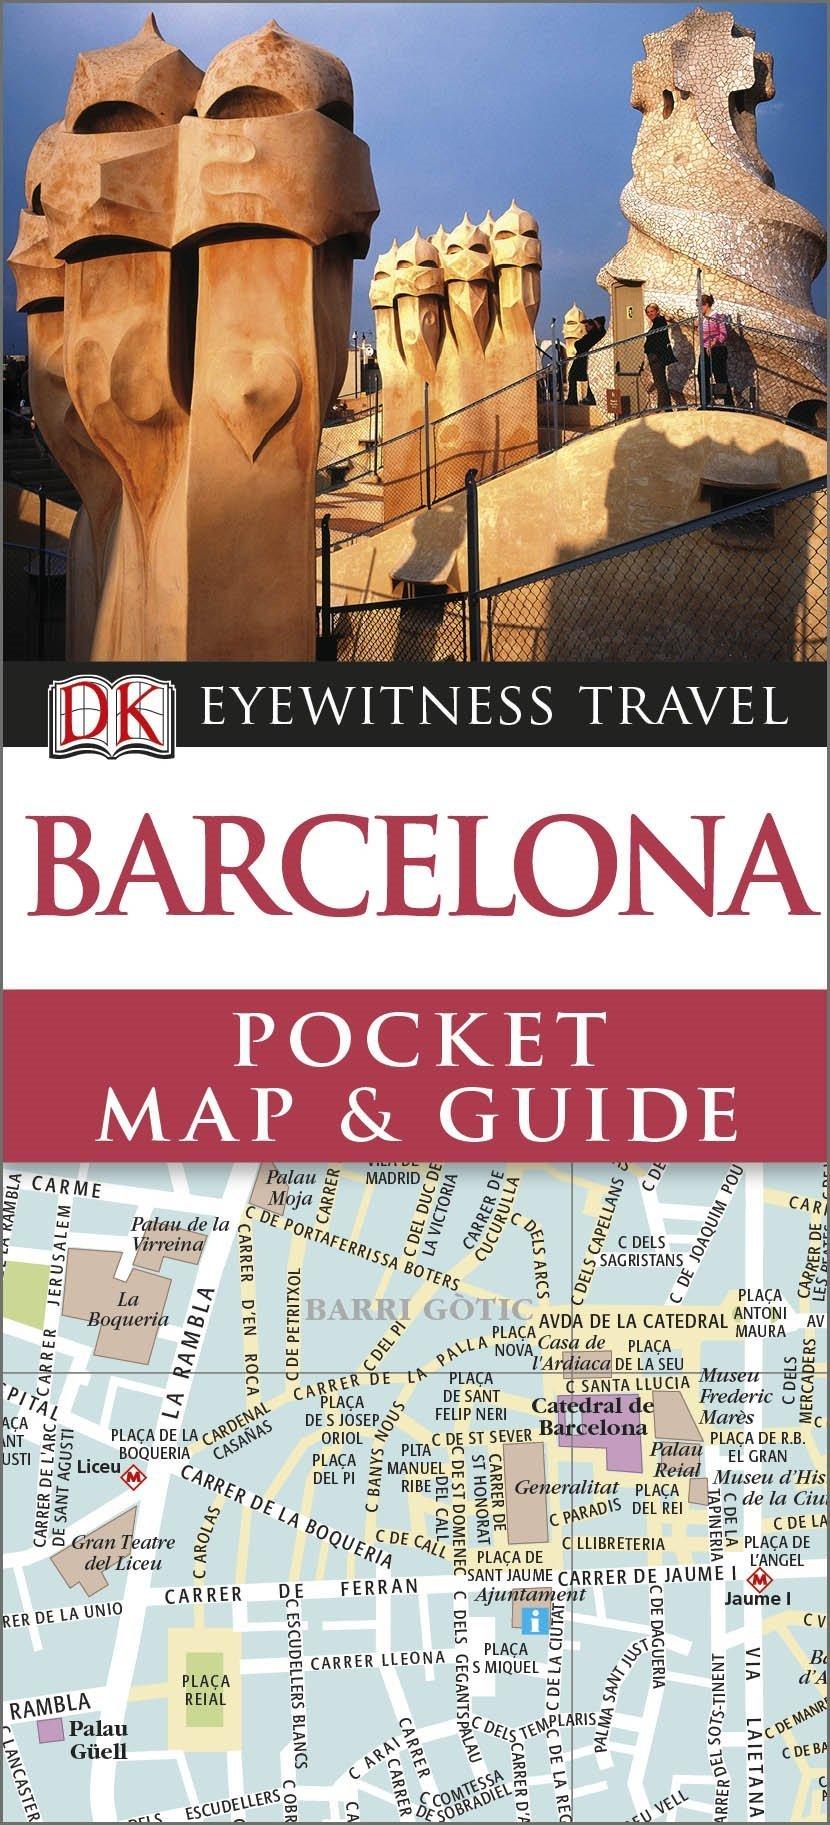 DK Eyewitness Pocket Map And Guide Barcelona Amazoncouk DK - Barcelona map guide